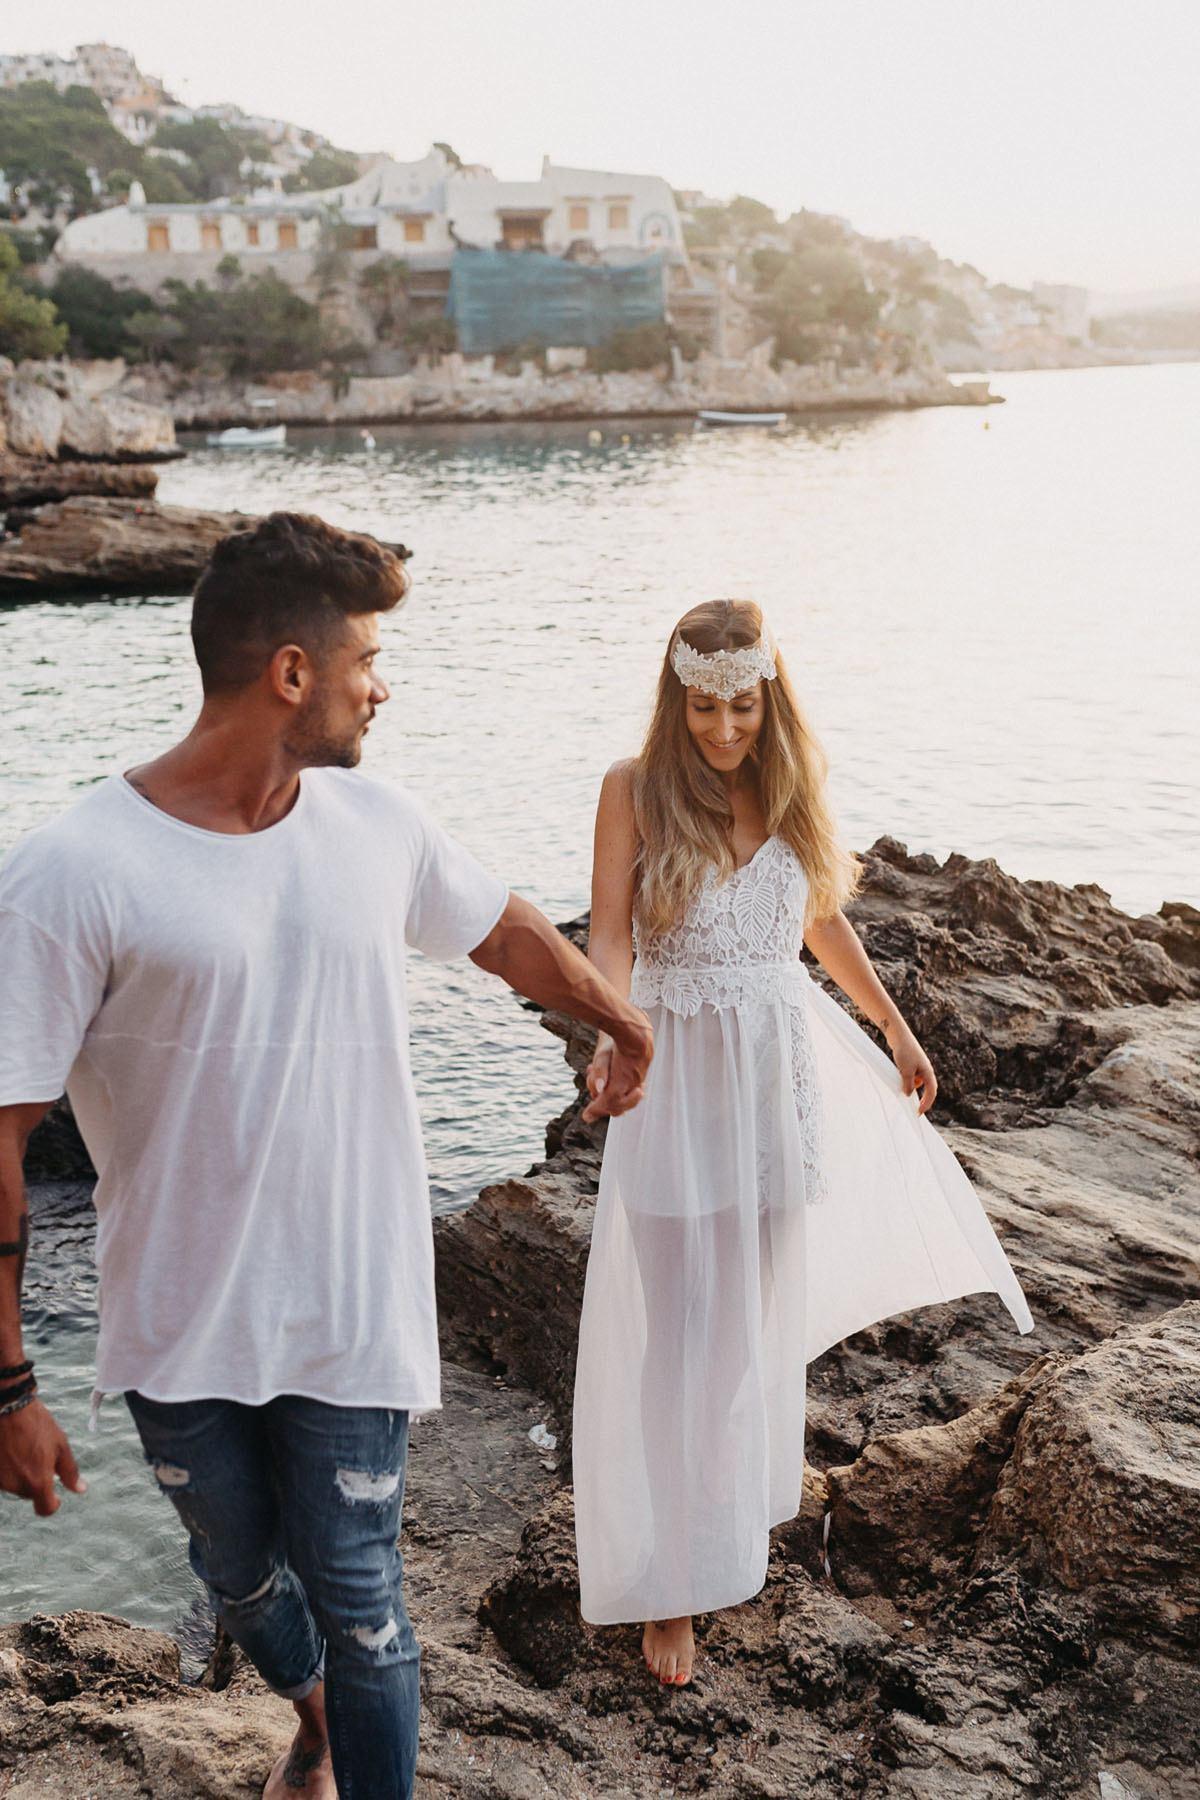 Photo-shooting am Strand Mallorca - Boho Brautpaar hand in hand